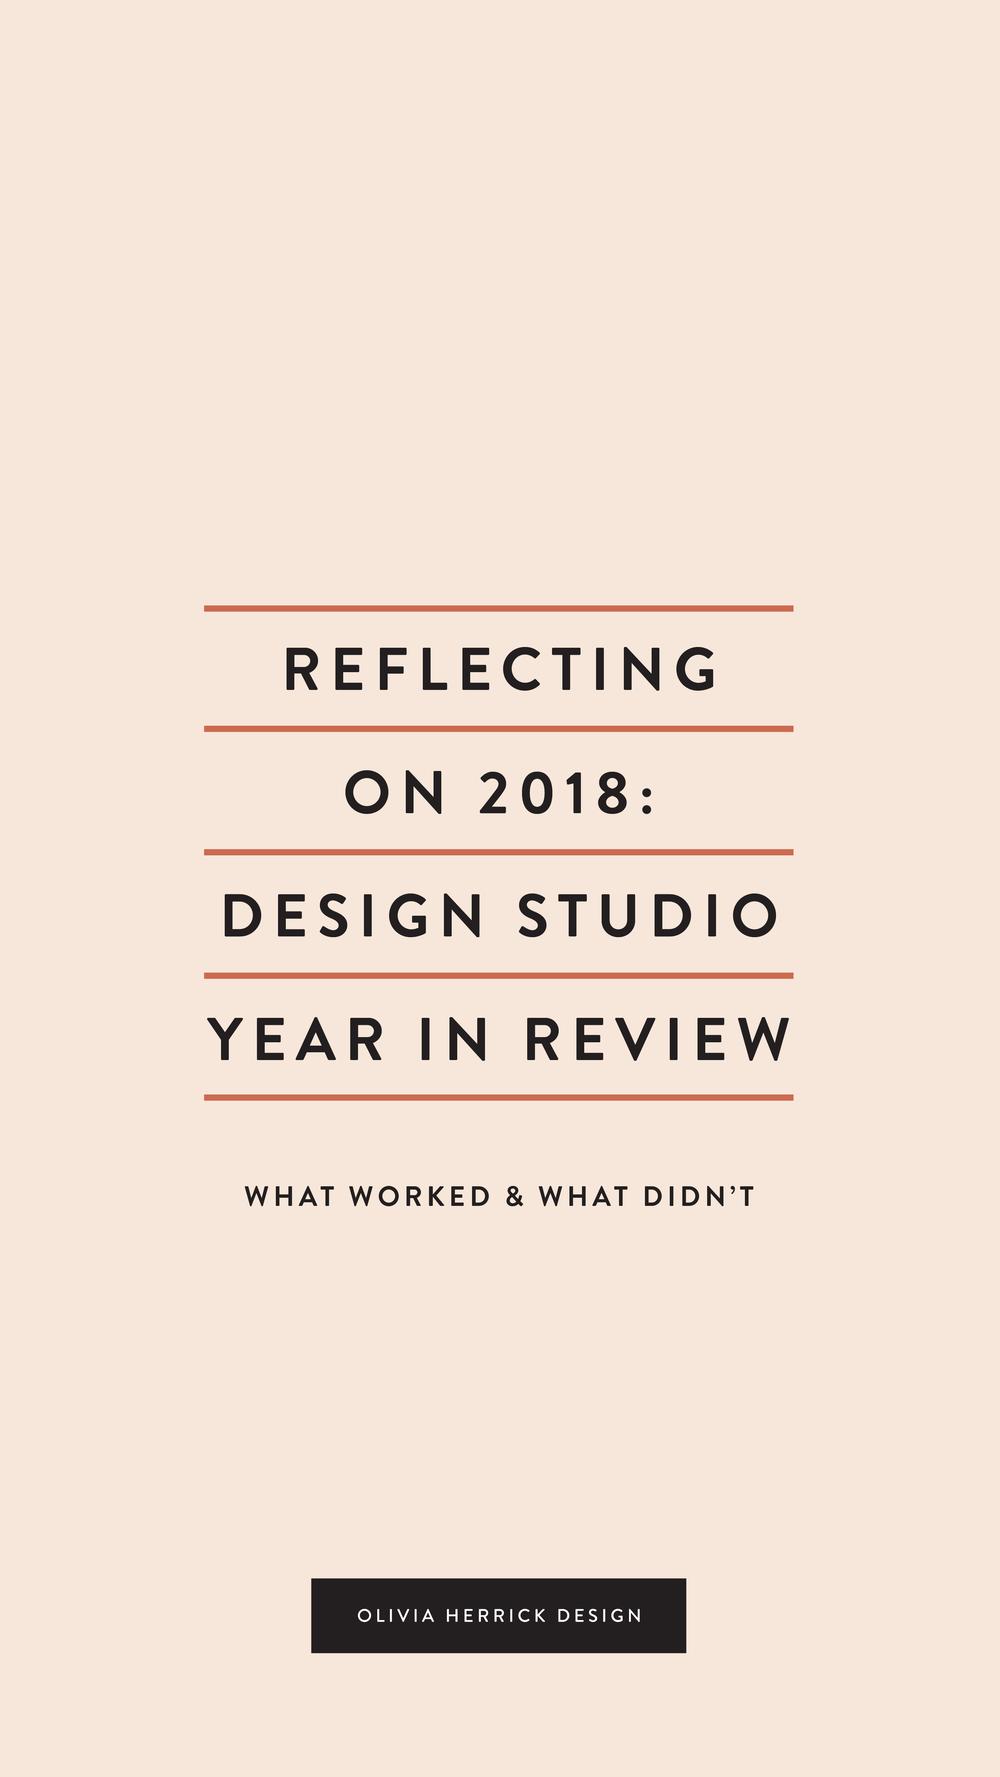 olivia-herrick-design-year-in-review-01.png